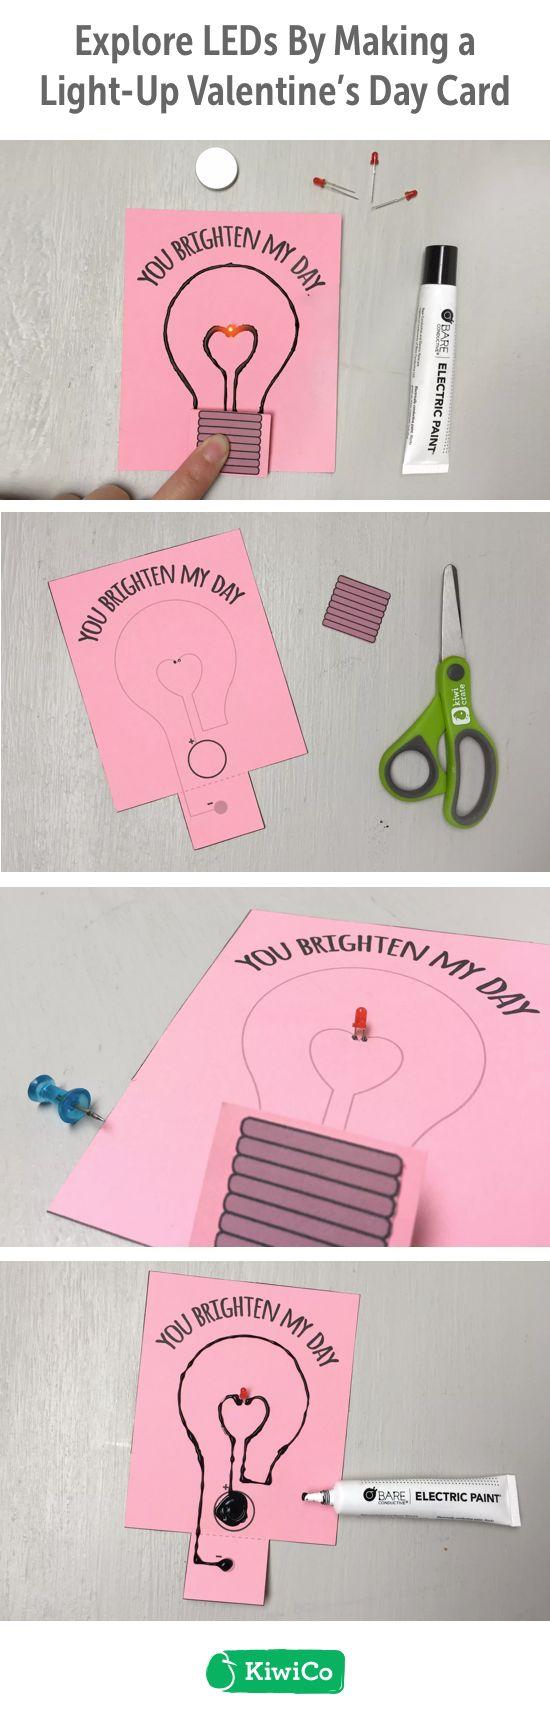 Best 25 DIY Valentines ideas for classmates ideas on Pinterest